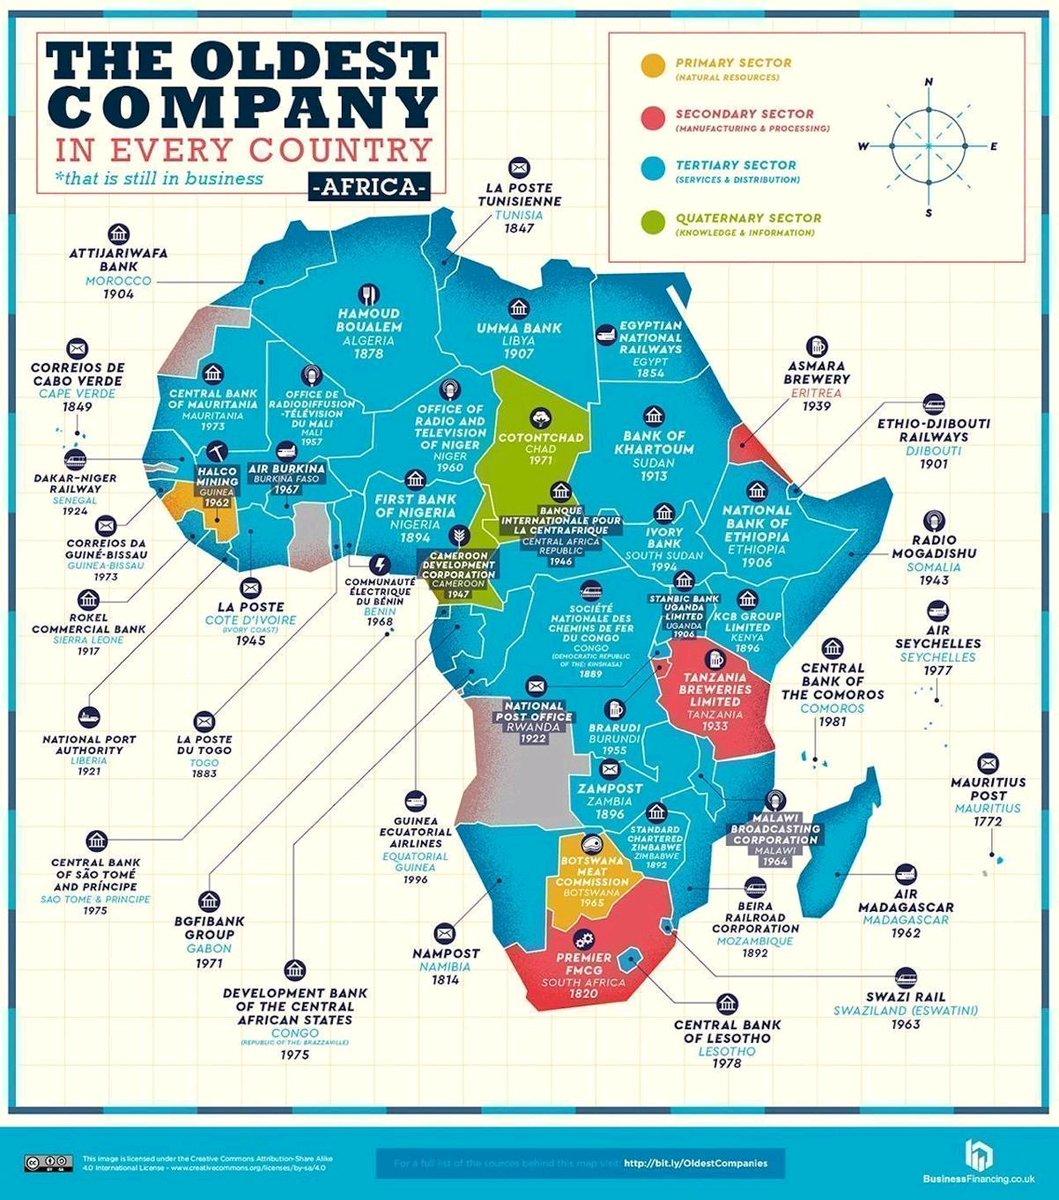 #Africanstartups pic.twitter.com/tuoG2RrIlT